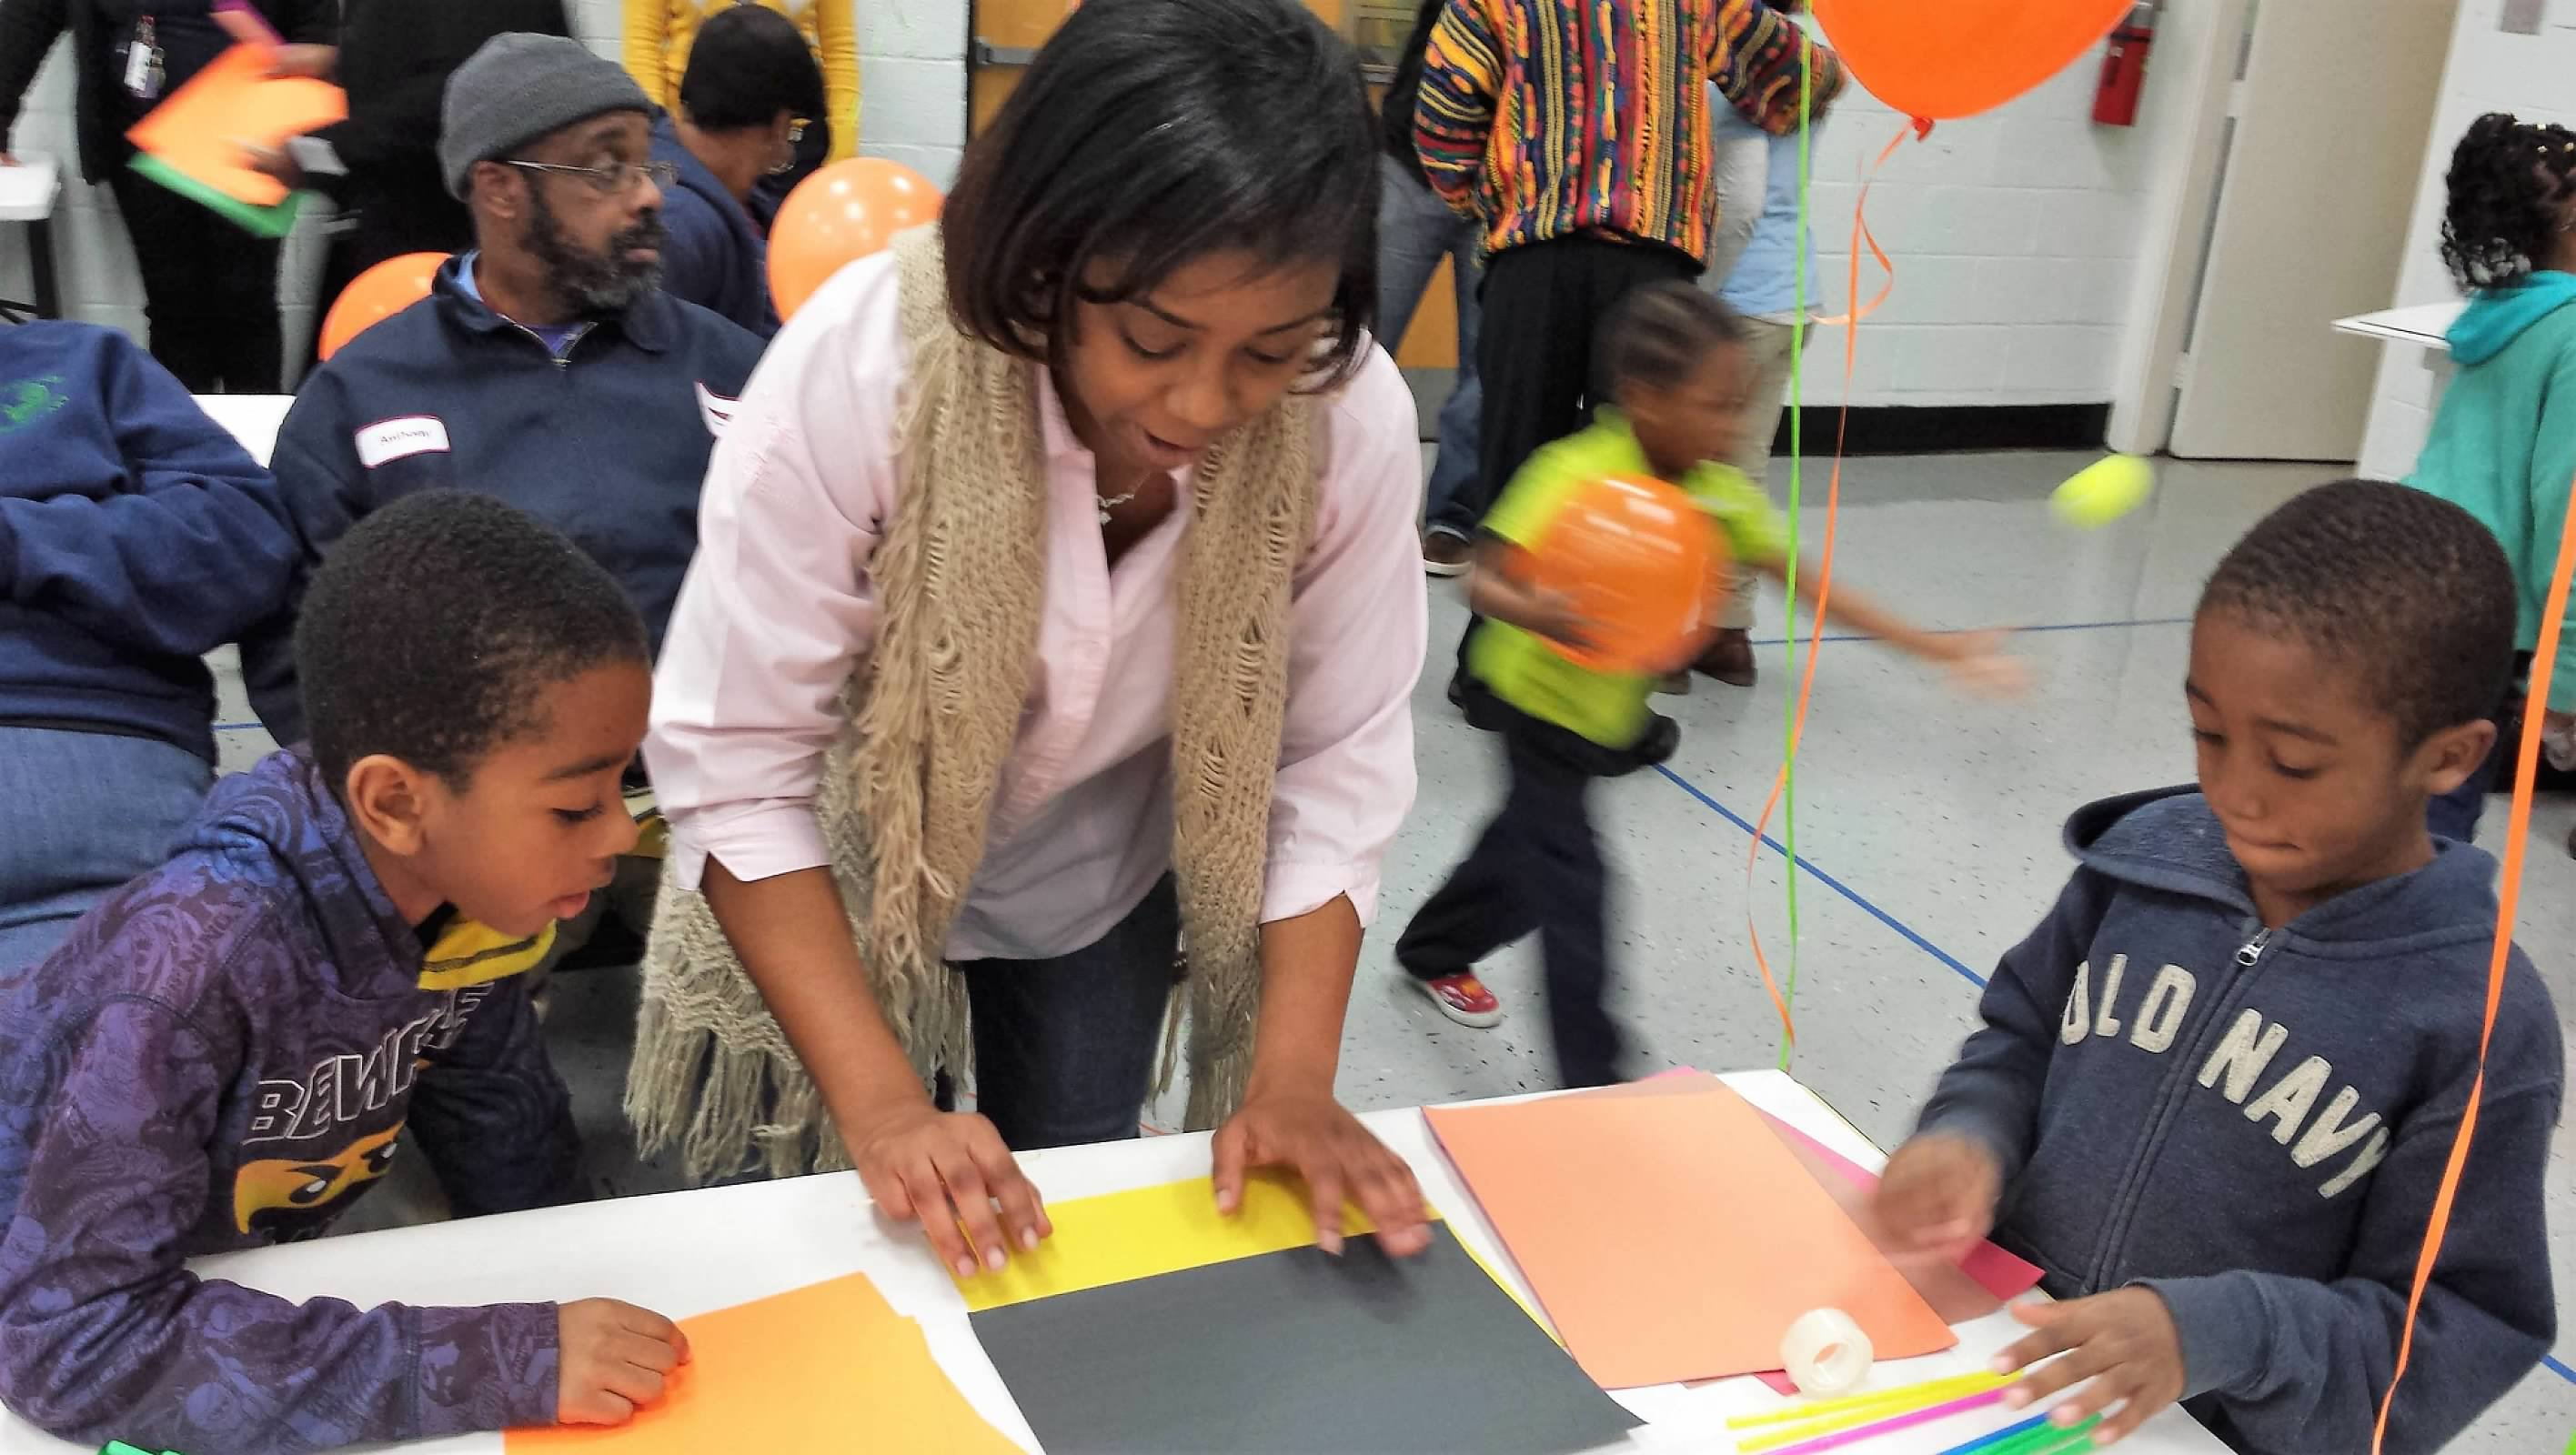 Volunteer for Family Science Night Oct. 31